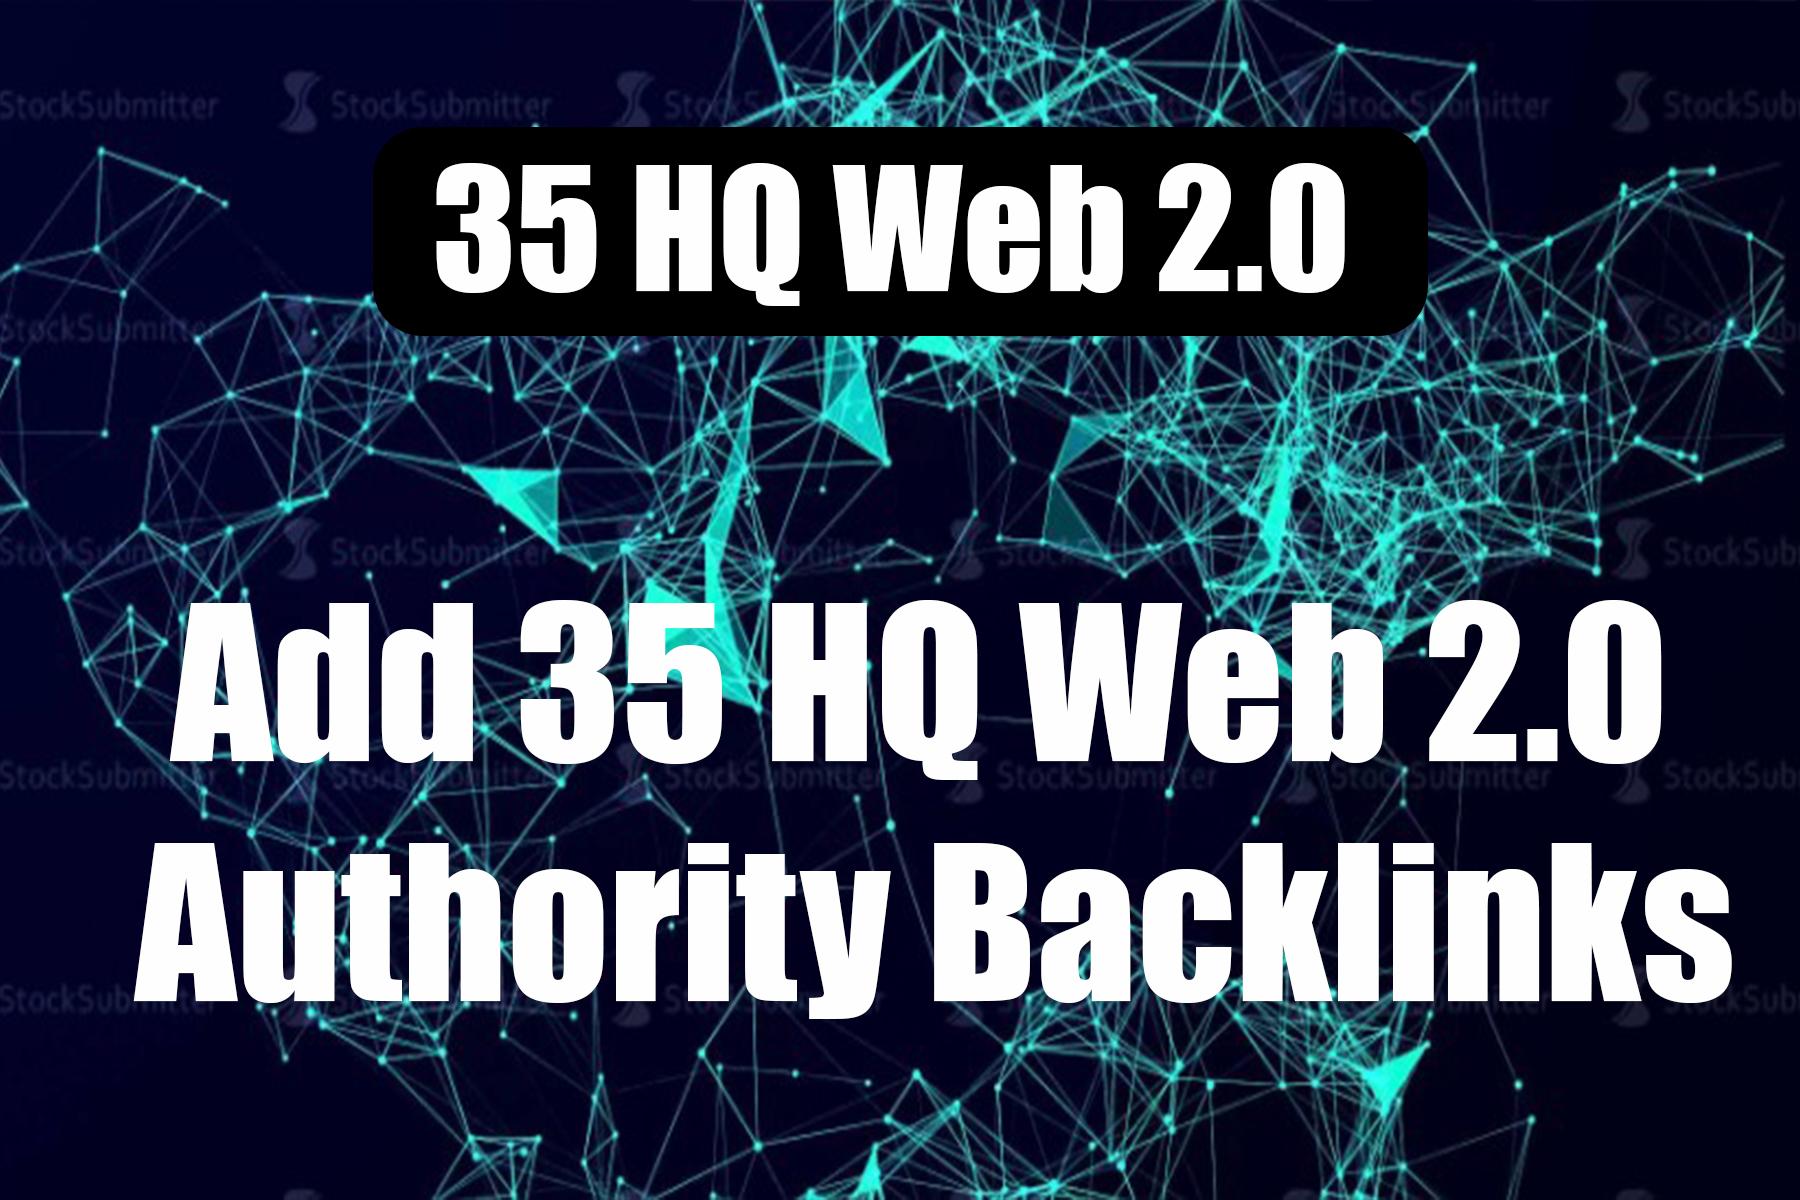 Add 35 HQ Web 2.0 Authority high quality Backlinks